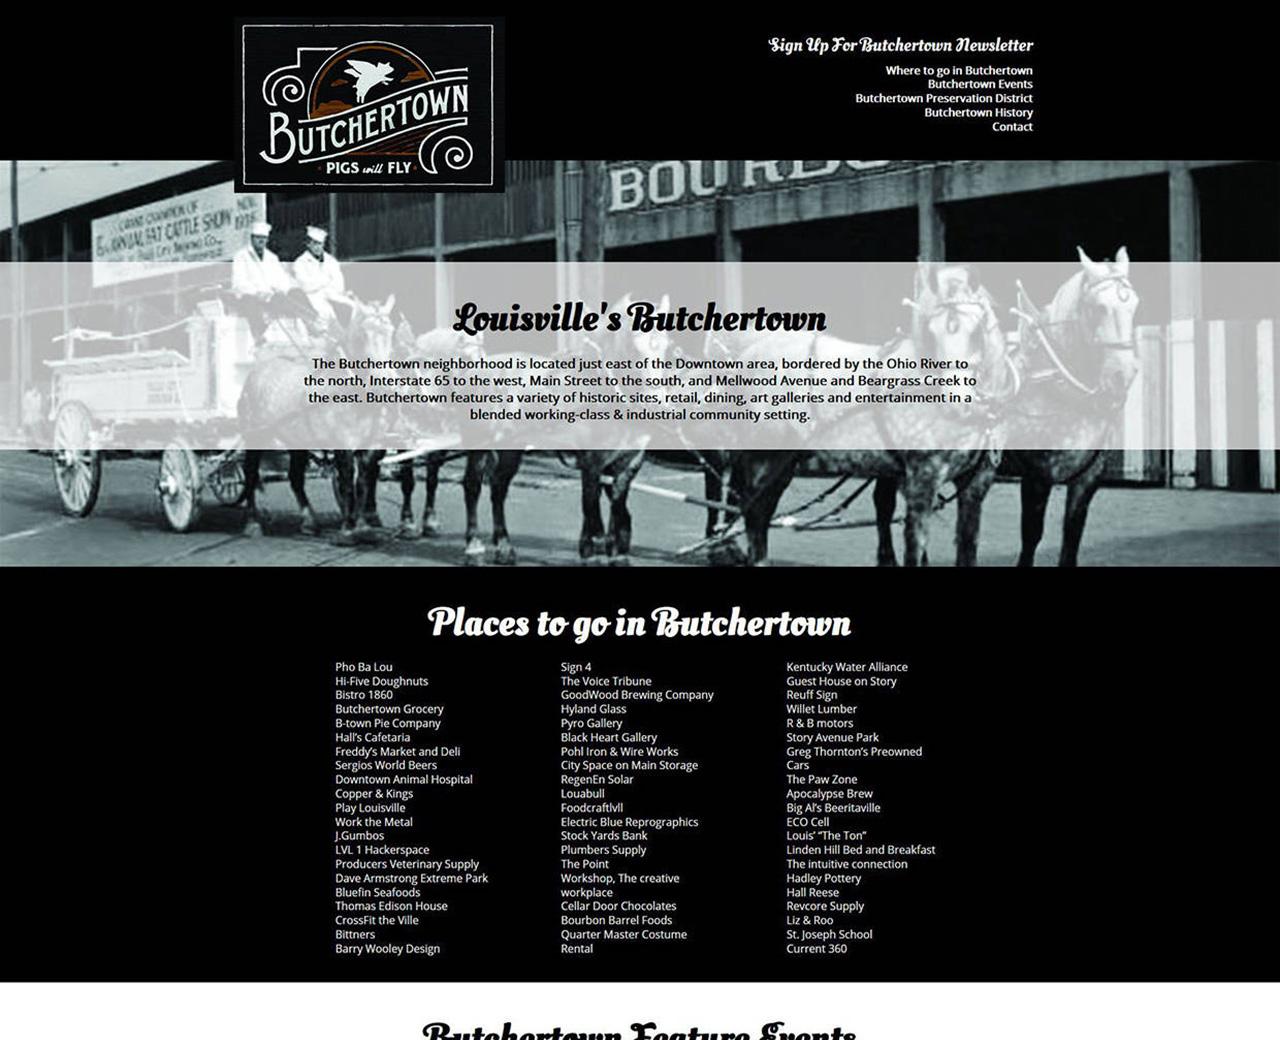 Louisville Butchertown - Louisville Web Design - Louisville SEO